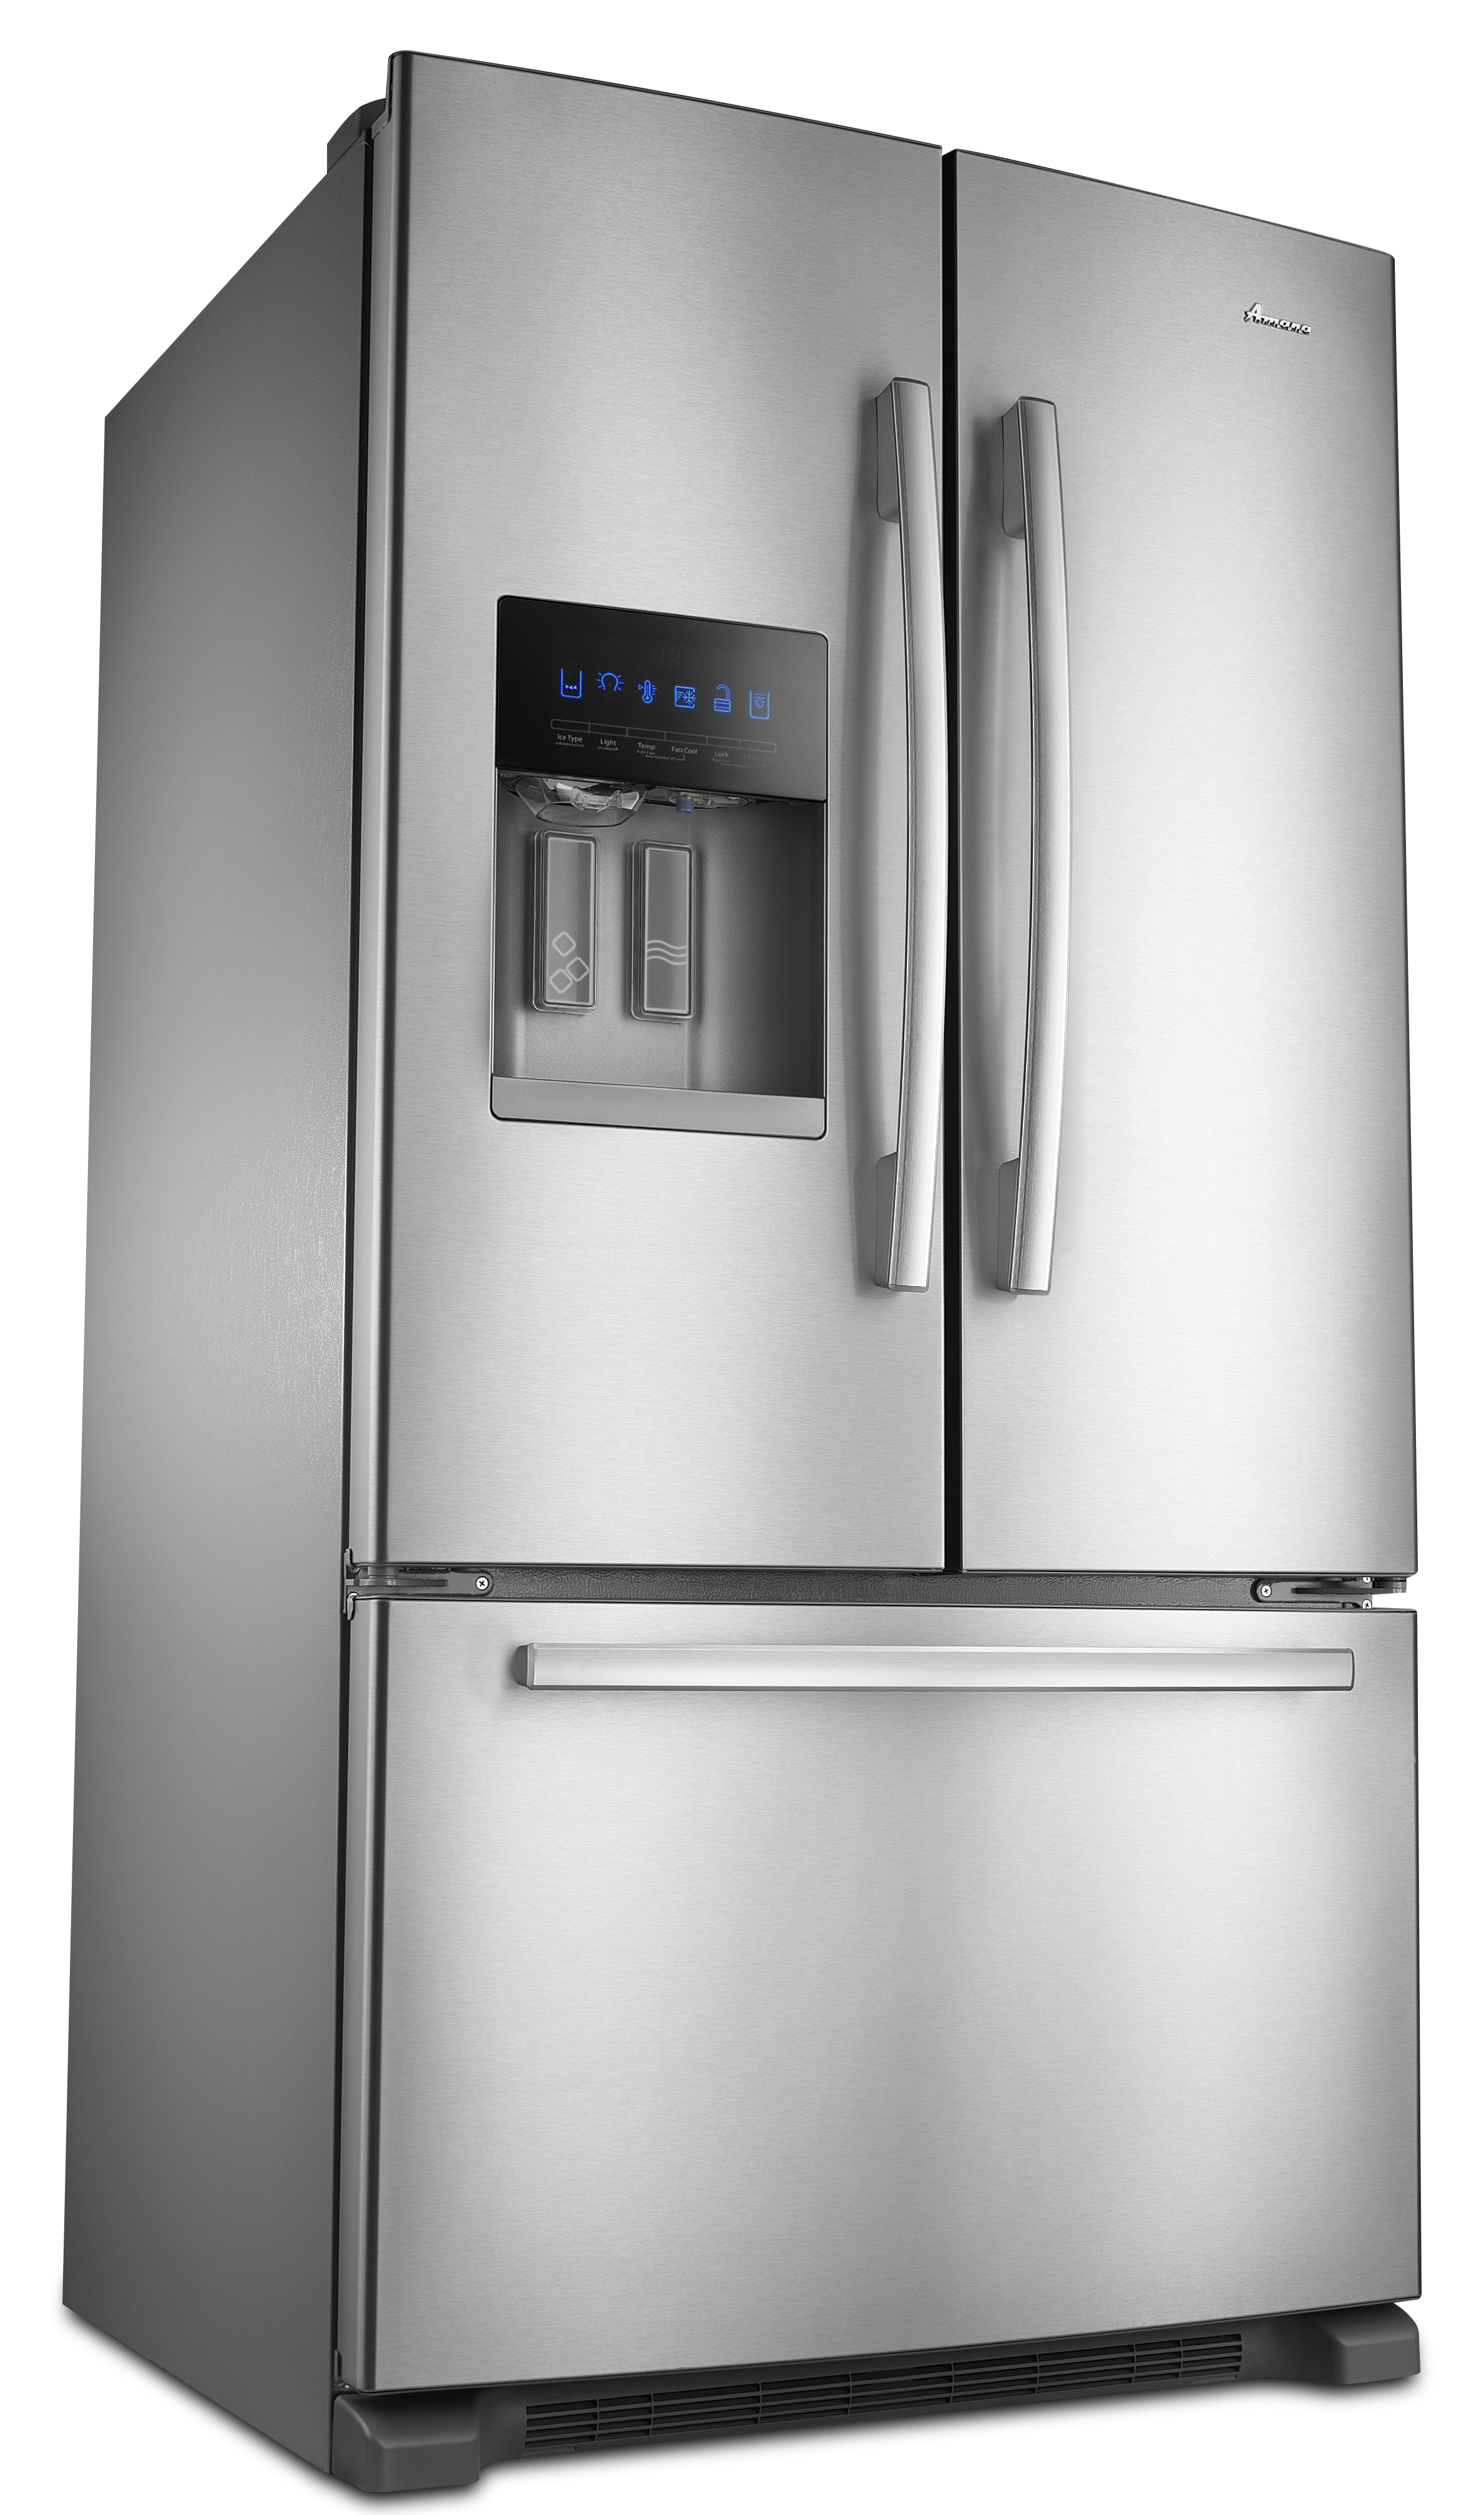 French Door Refrigerator Appliances Brainerd Mn 56401